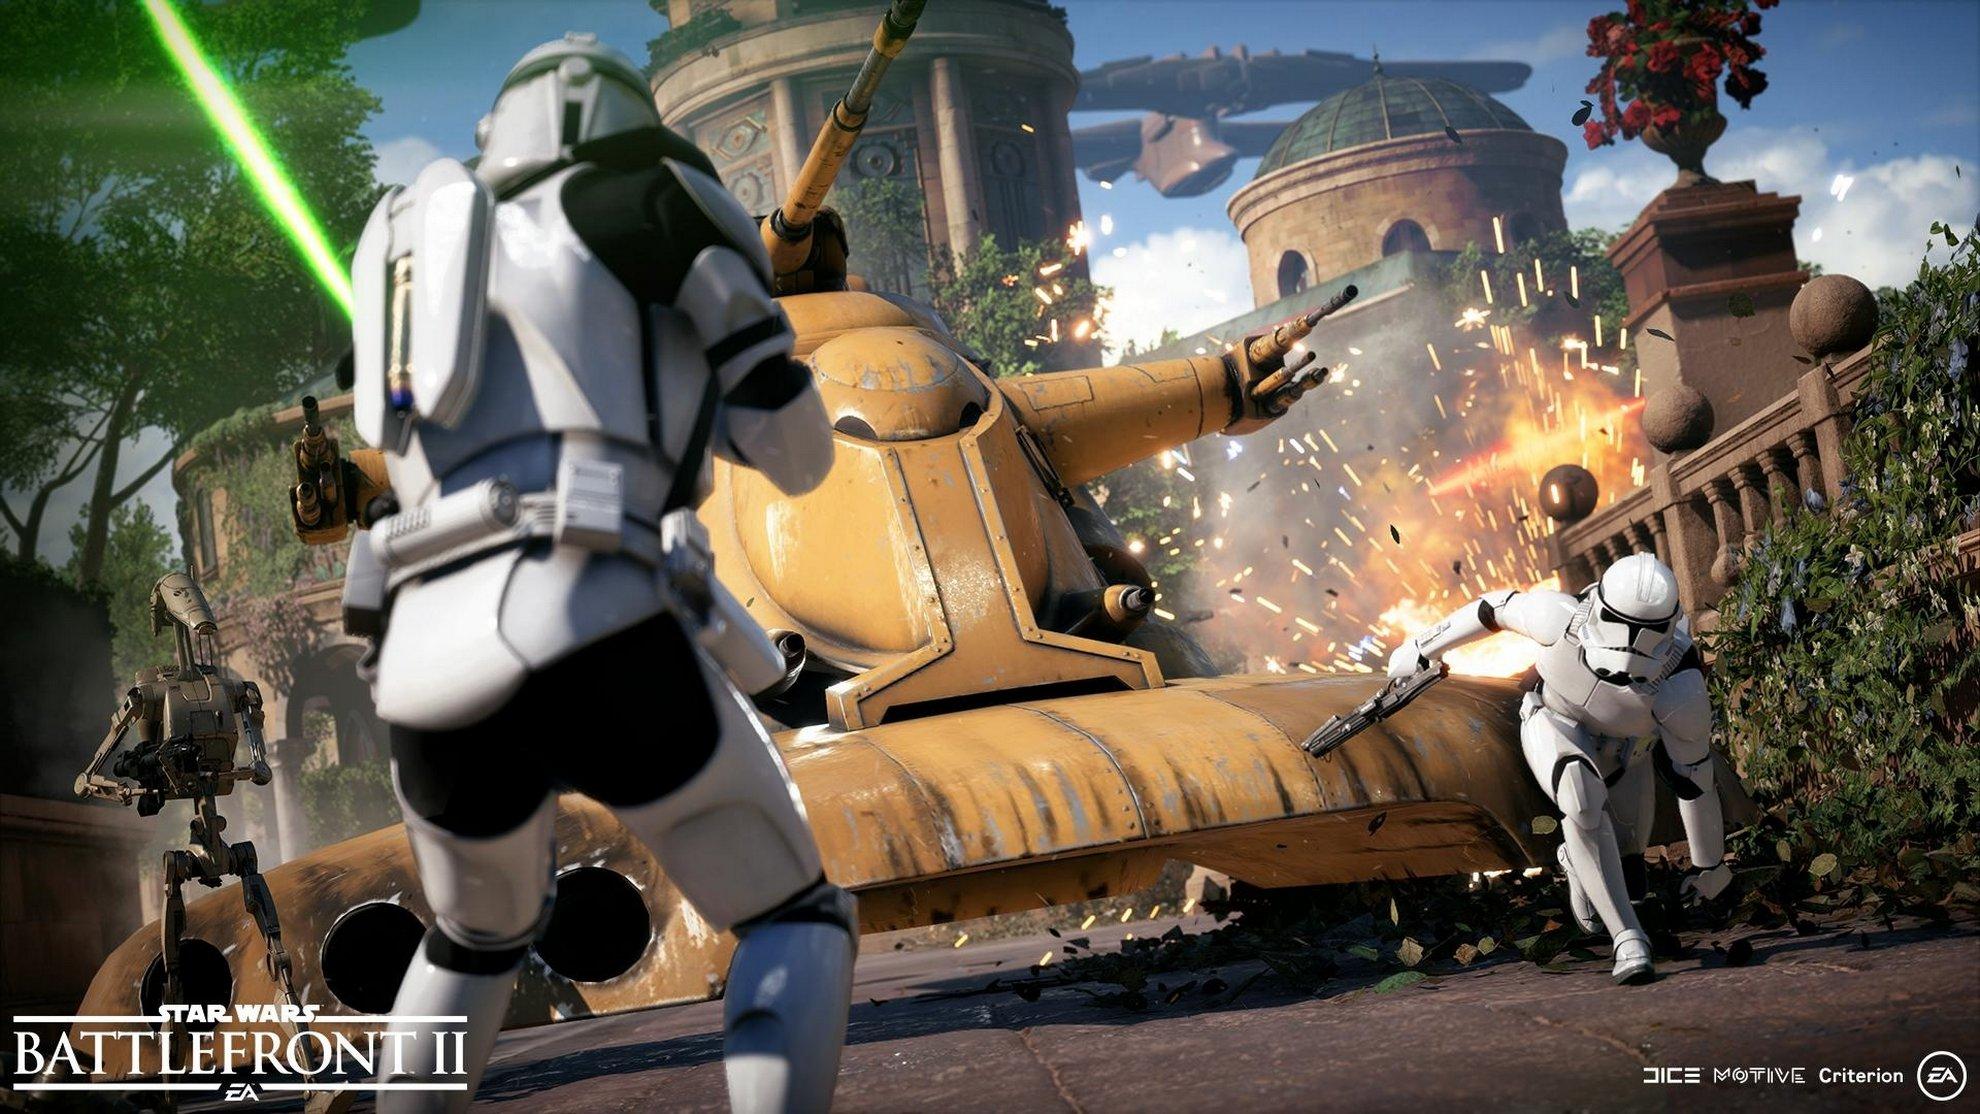 Star-Wars-Battlefront-II-4.jpg